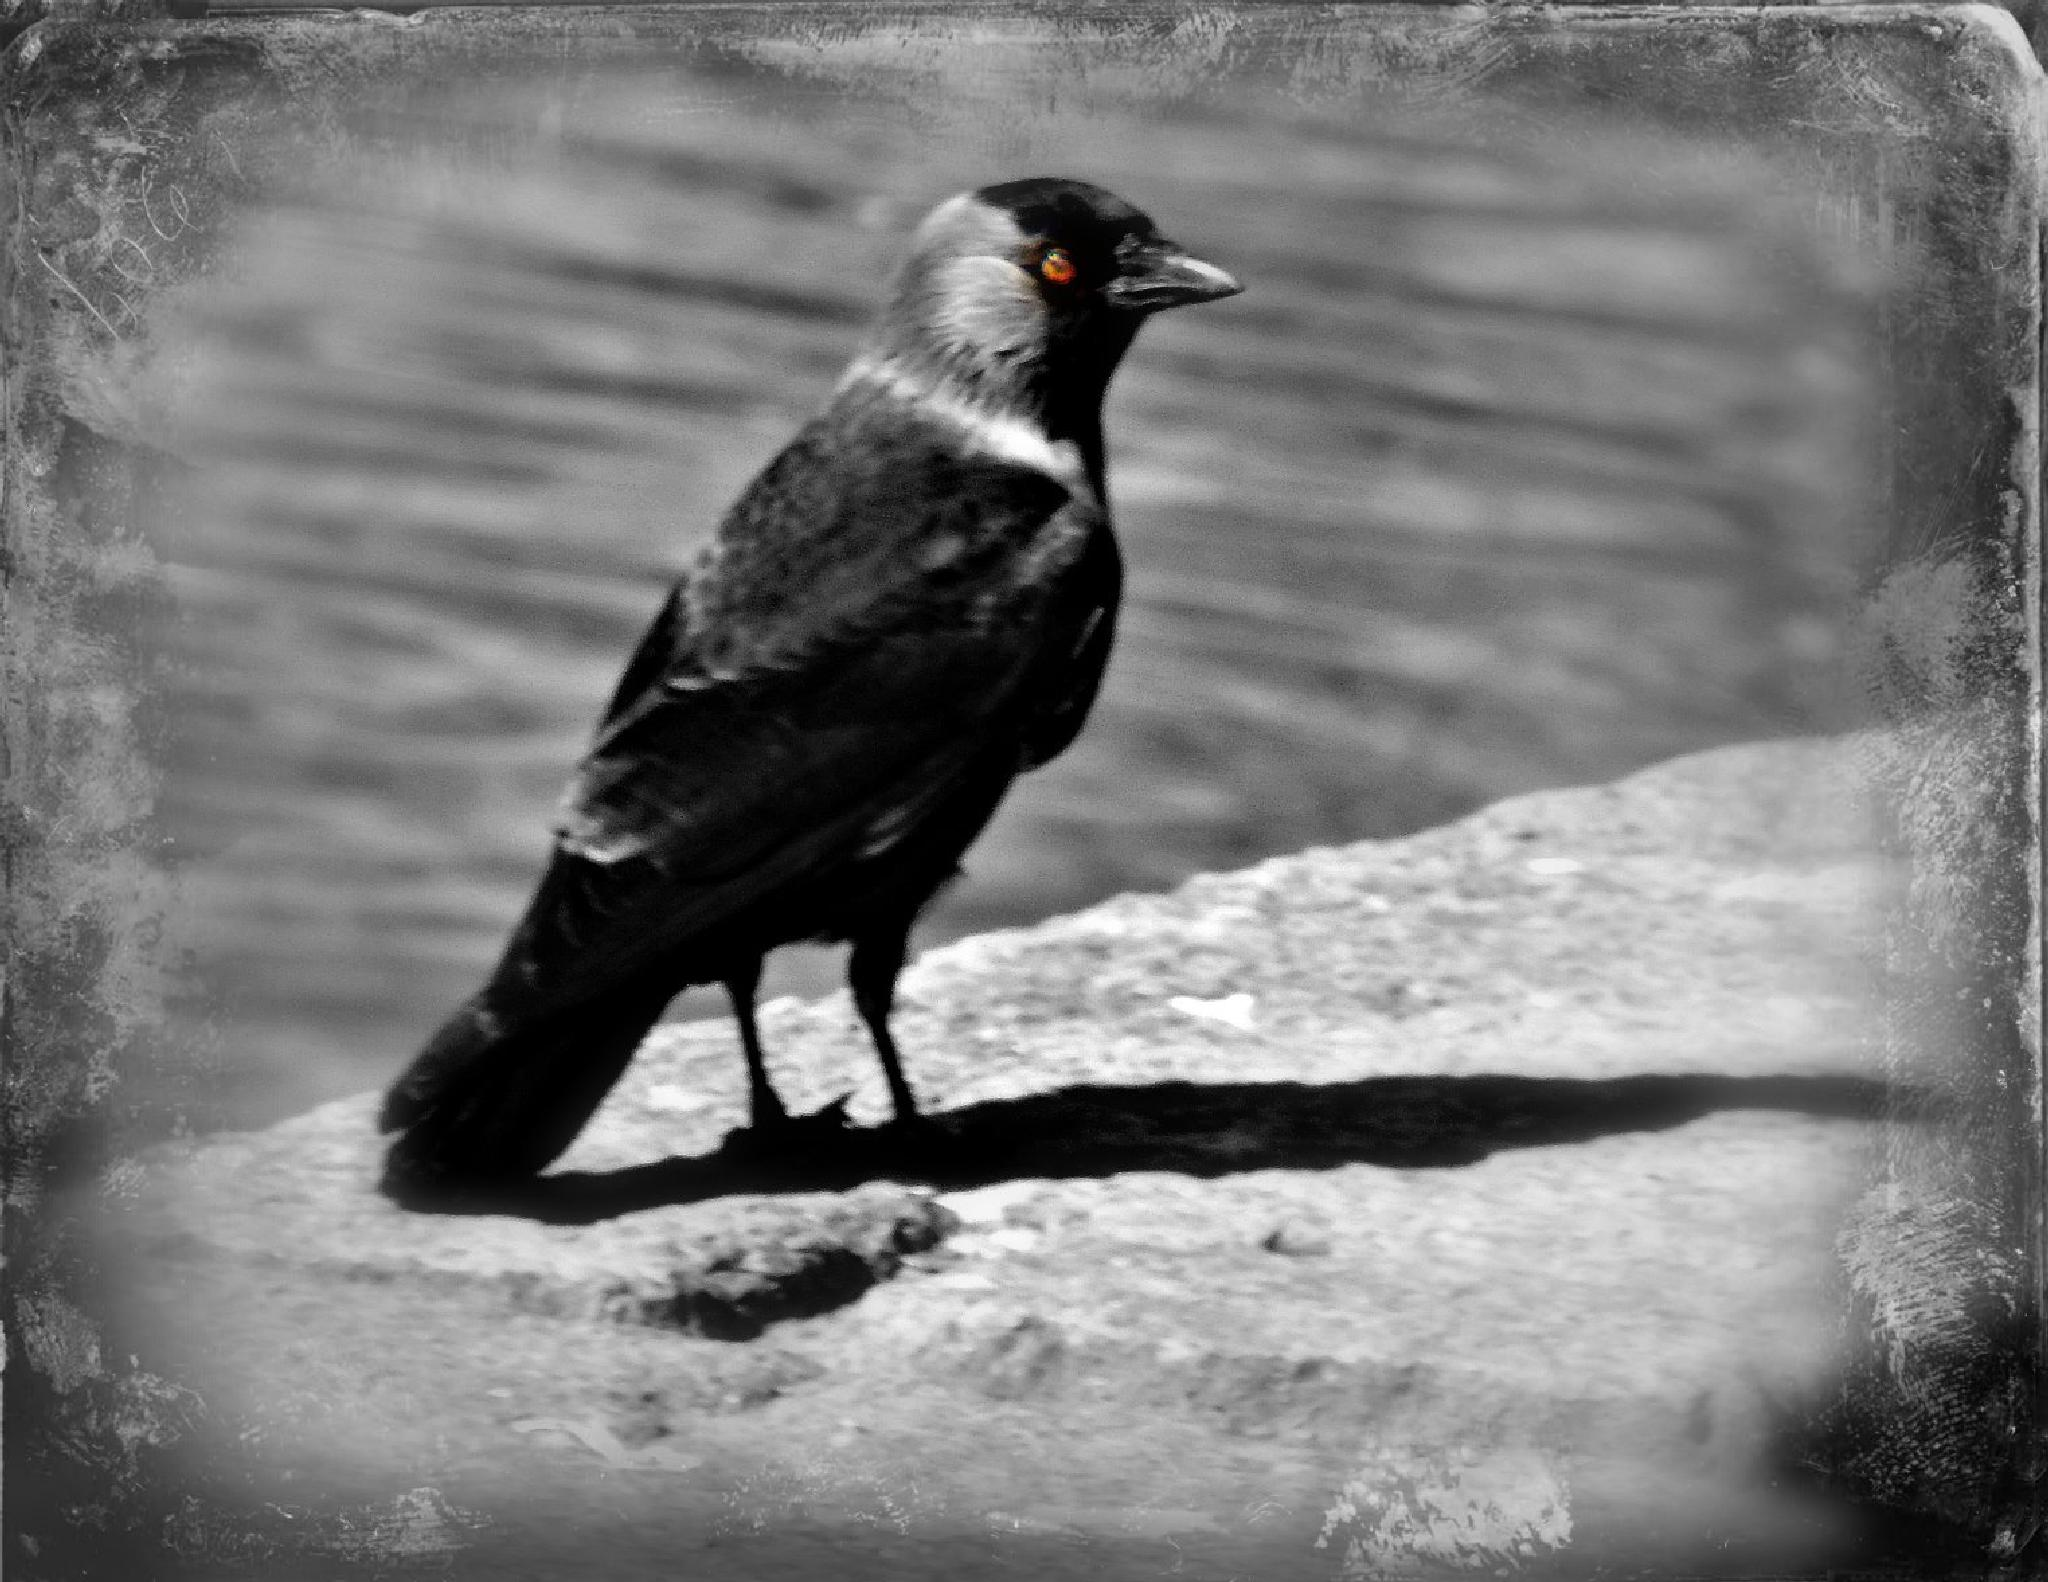 The black bird by ronnie.billstrom